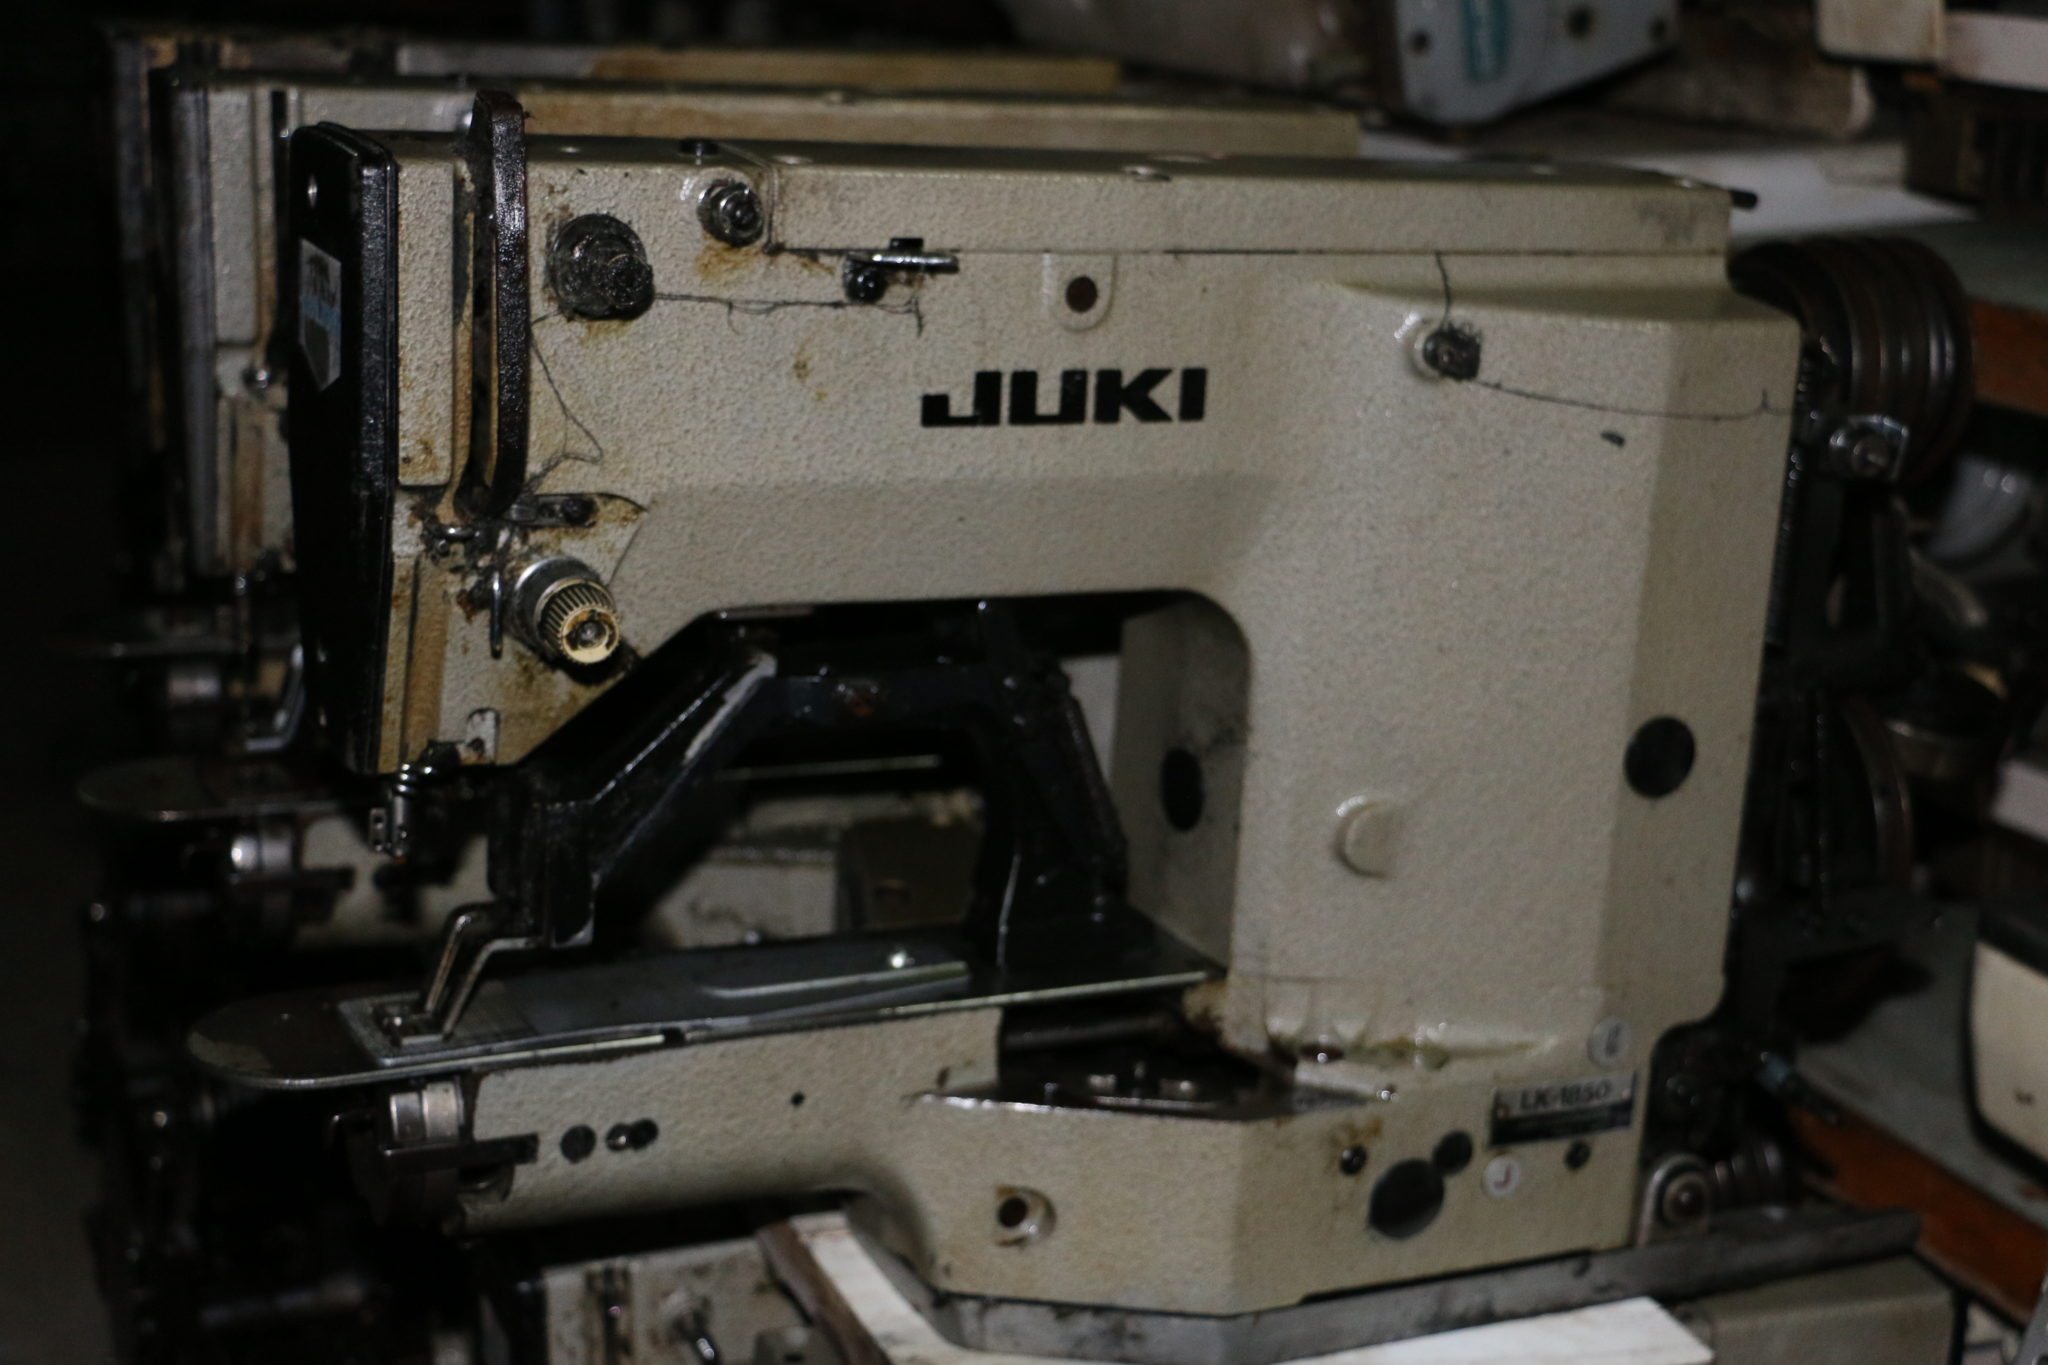 1850 sewing machine